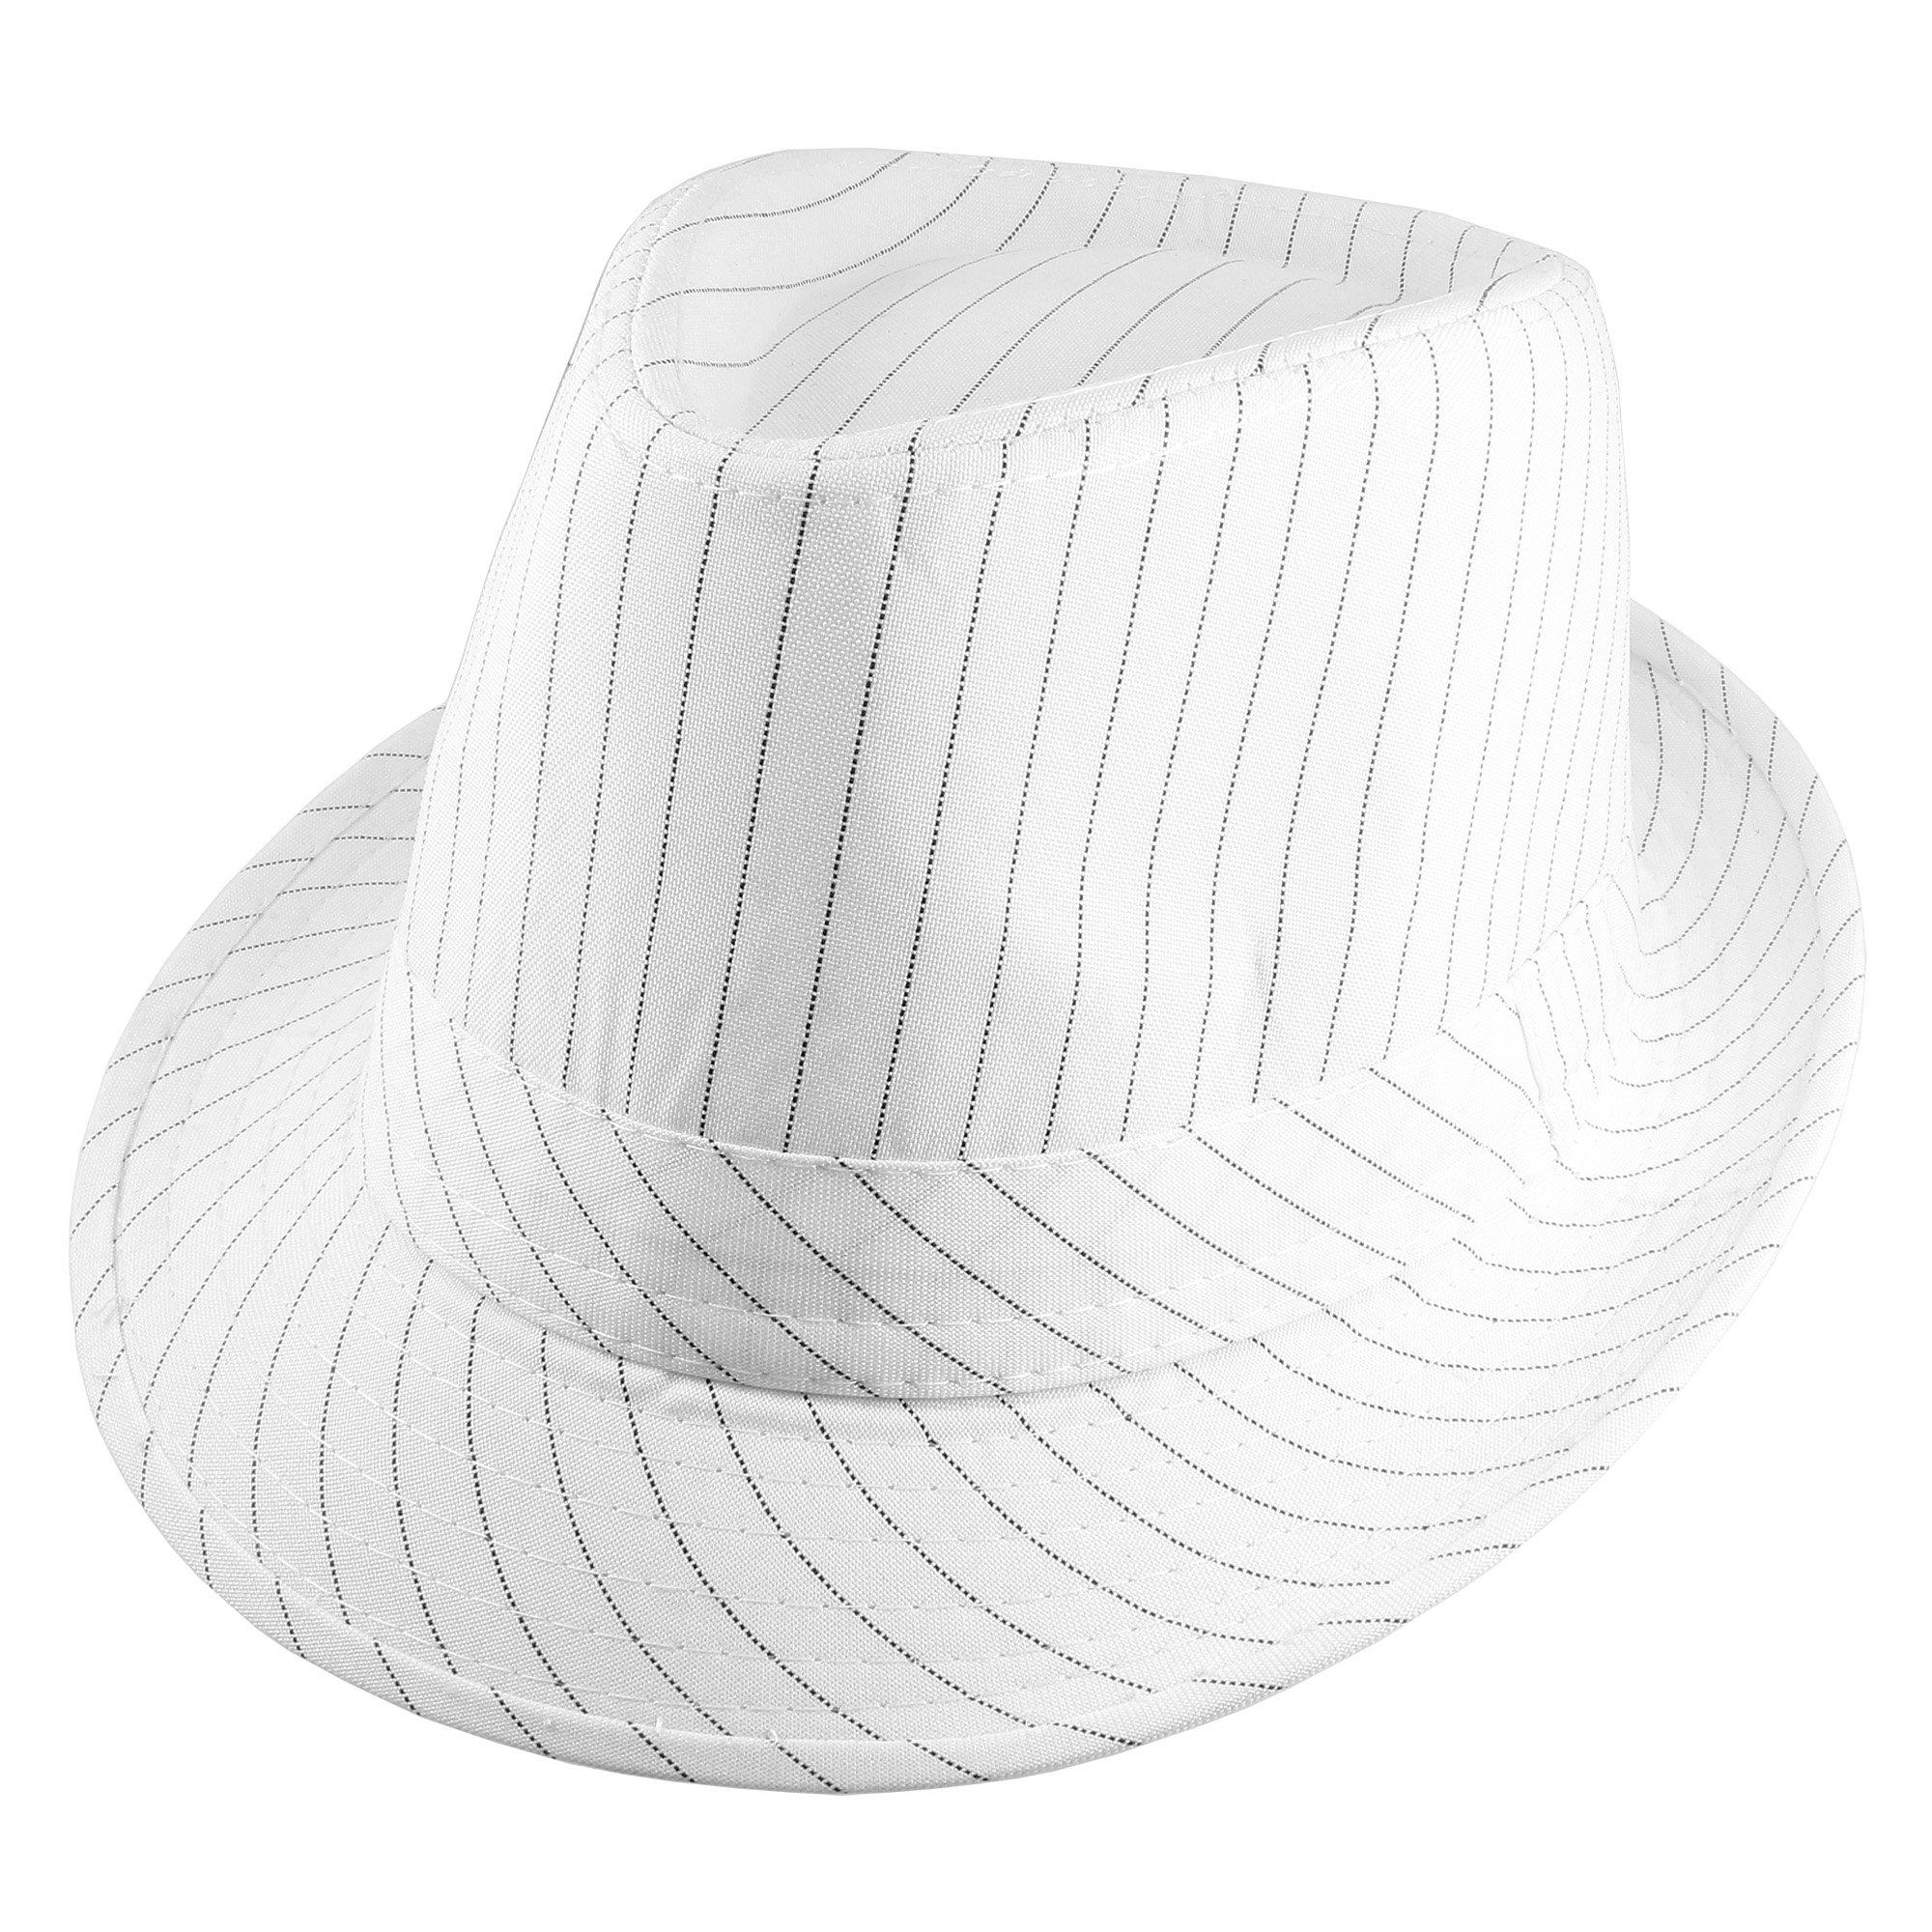 Gelante Classic Narrow Brim Gangster Trilby Cotton Blend Fabric Fedora Hat M217-White-L/XL